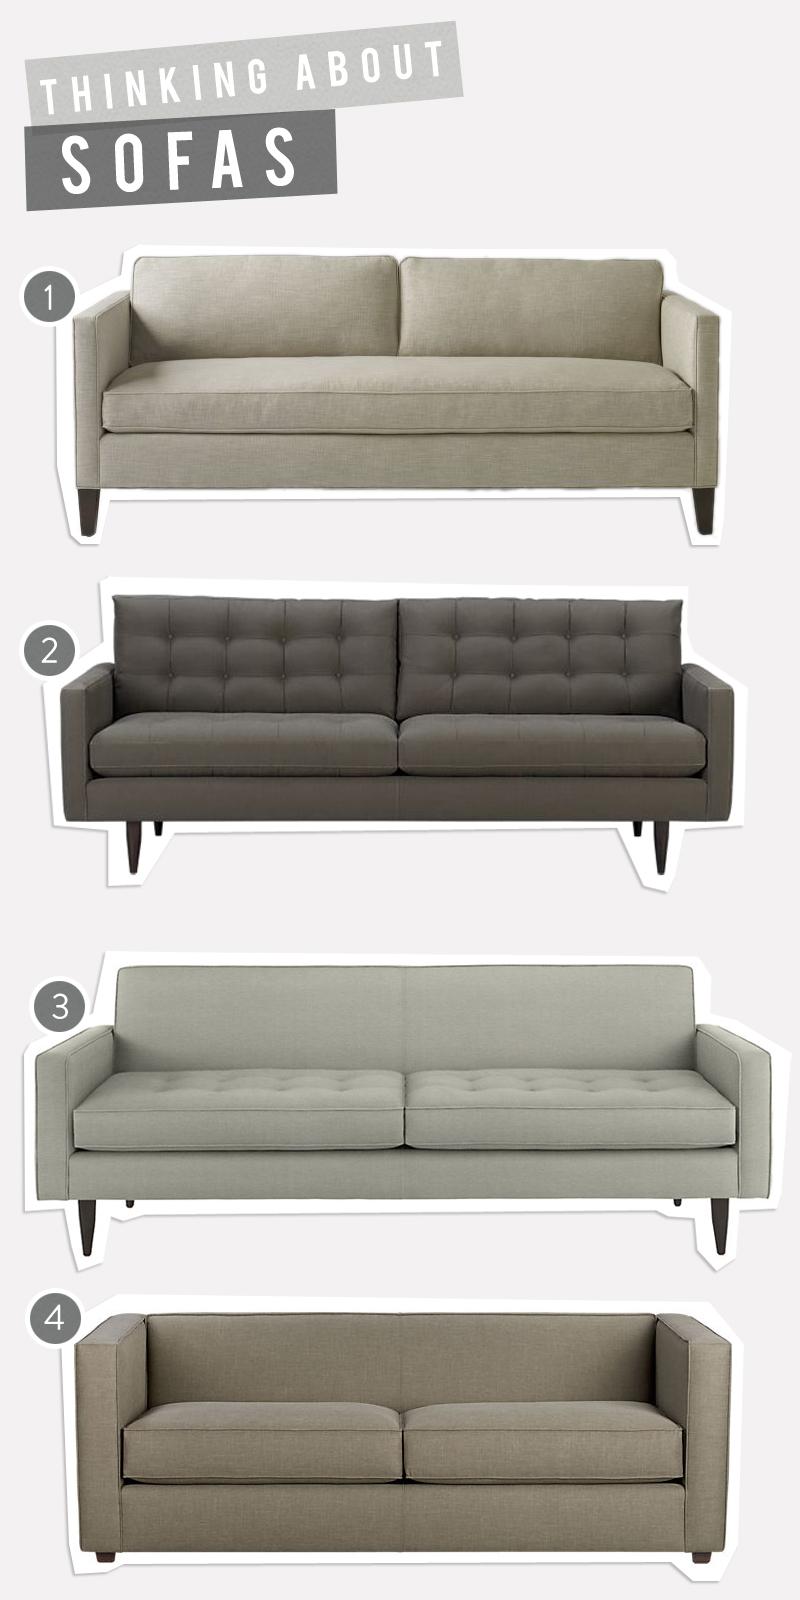 west elm dunham sofa reviews sales online thinking about sofas deuce cities henhouse